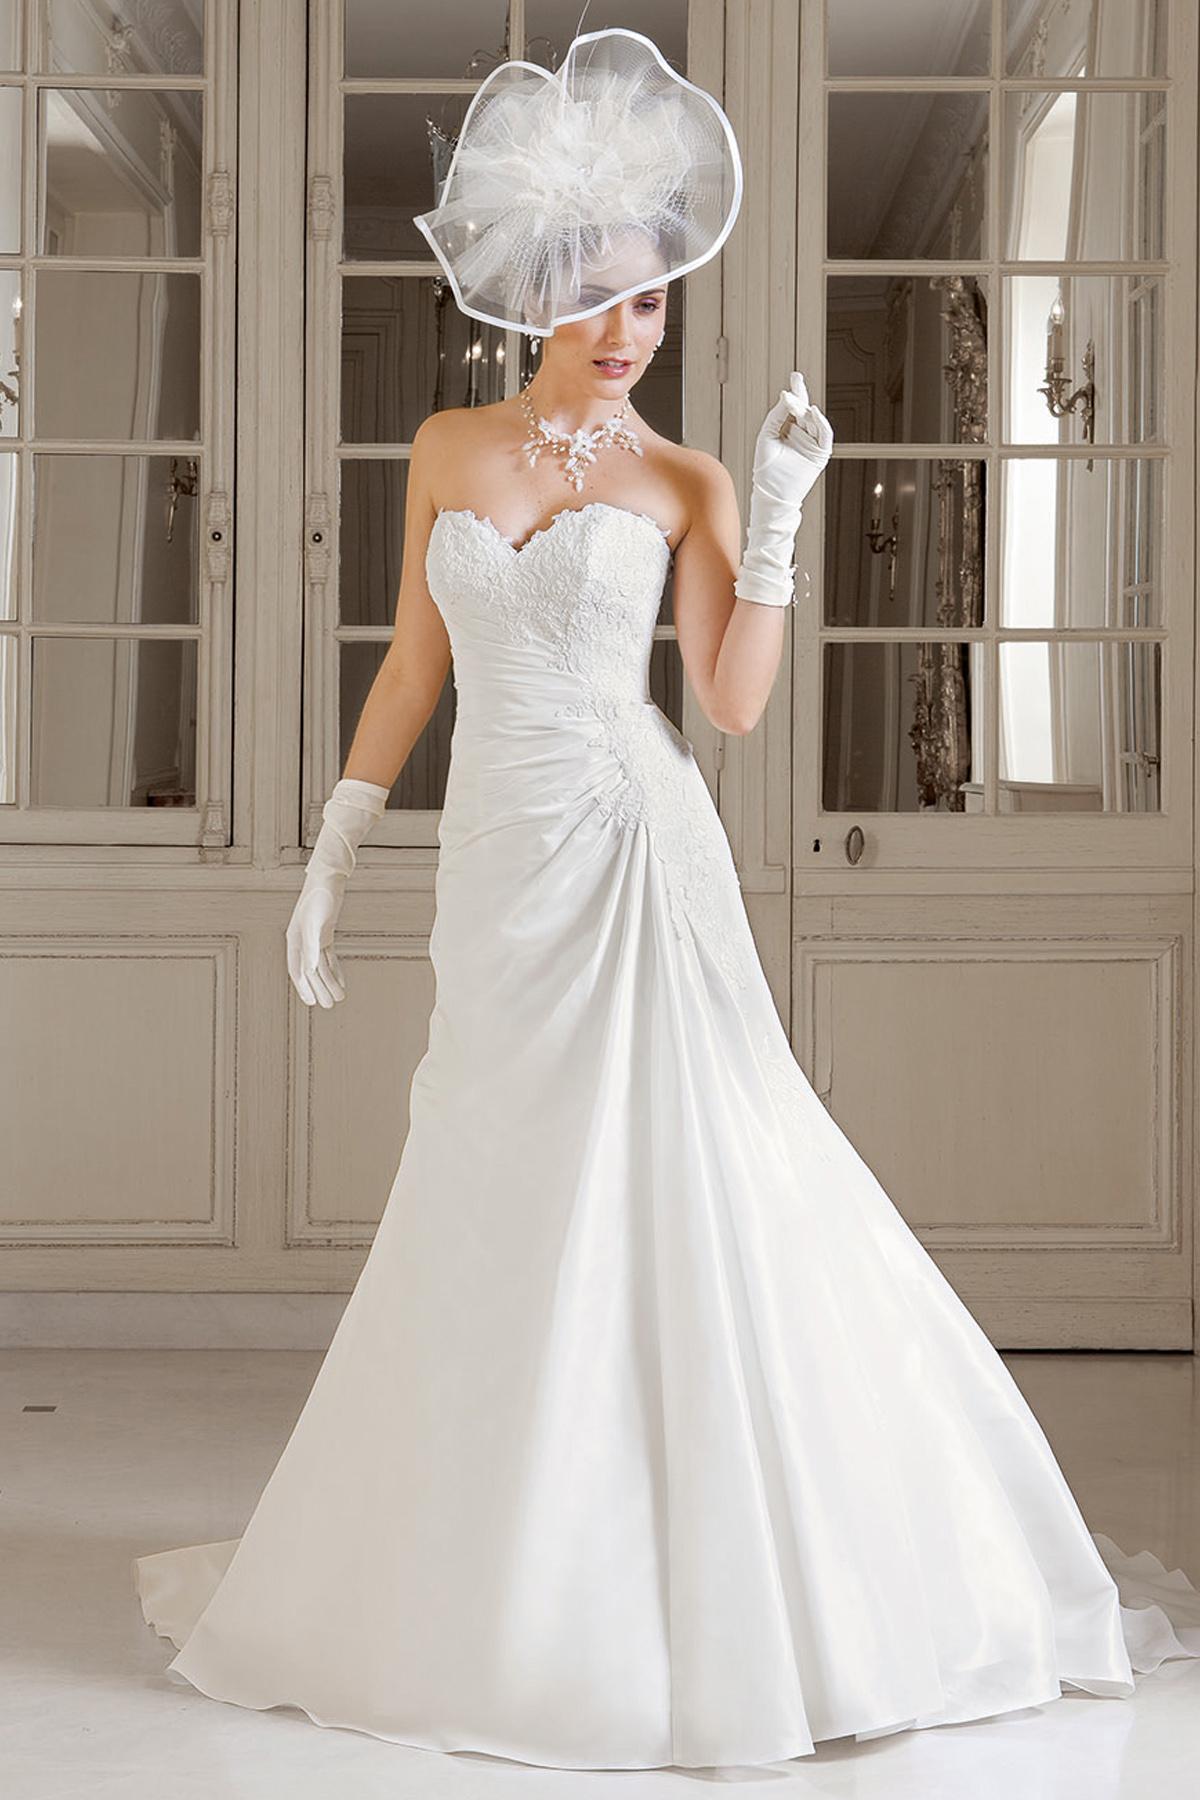 4e403febc16 Les modeles des robes de mariage - Chapka